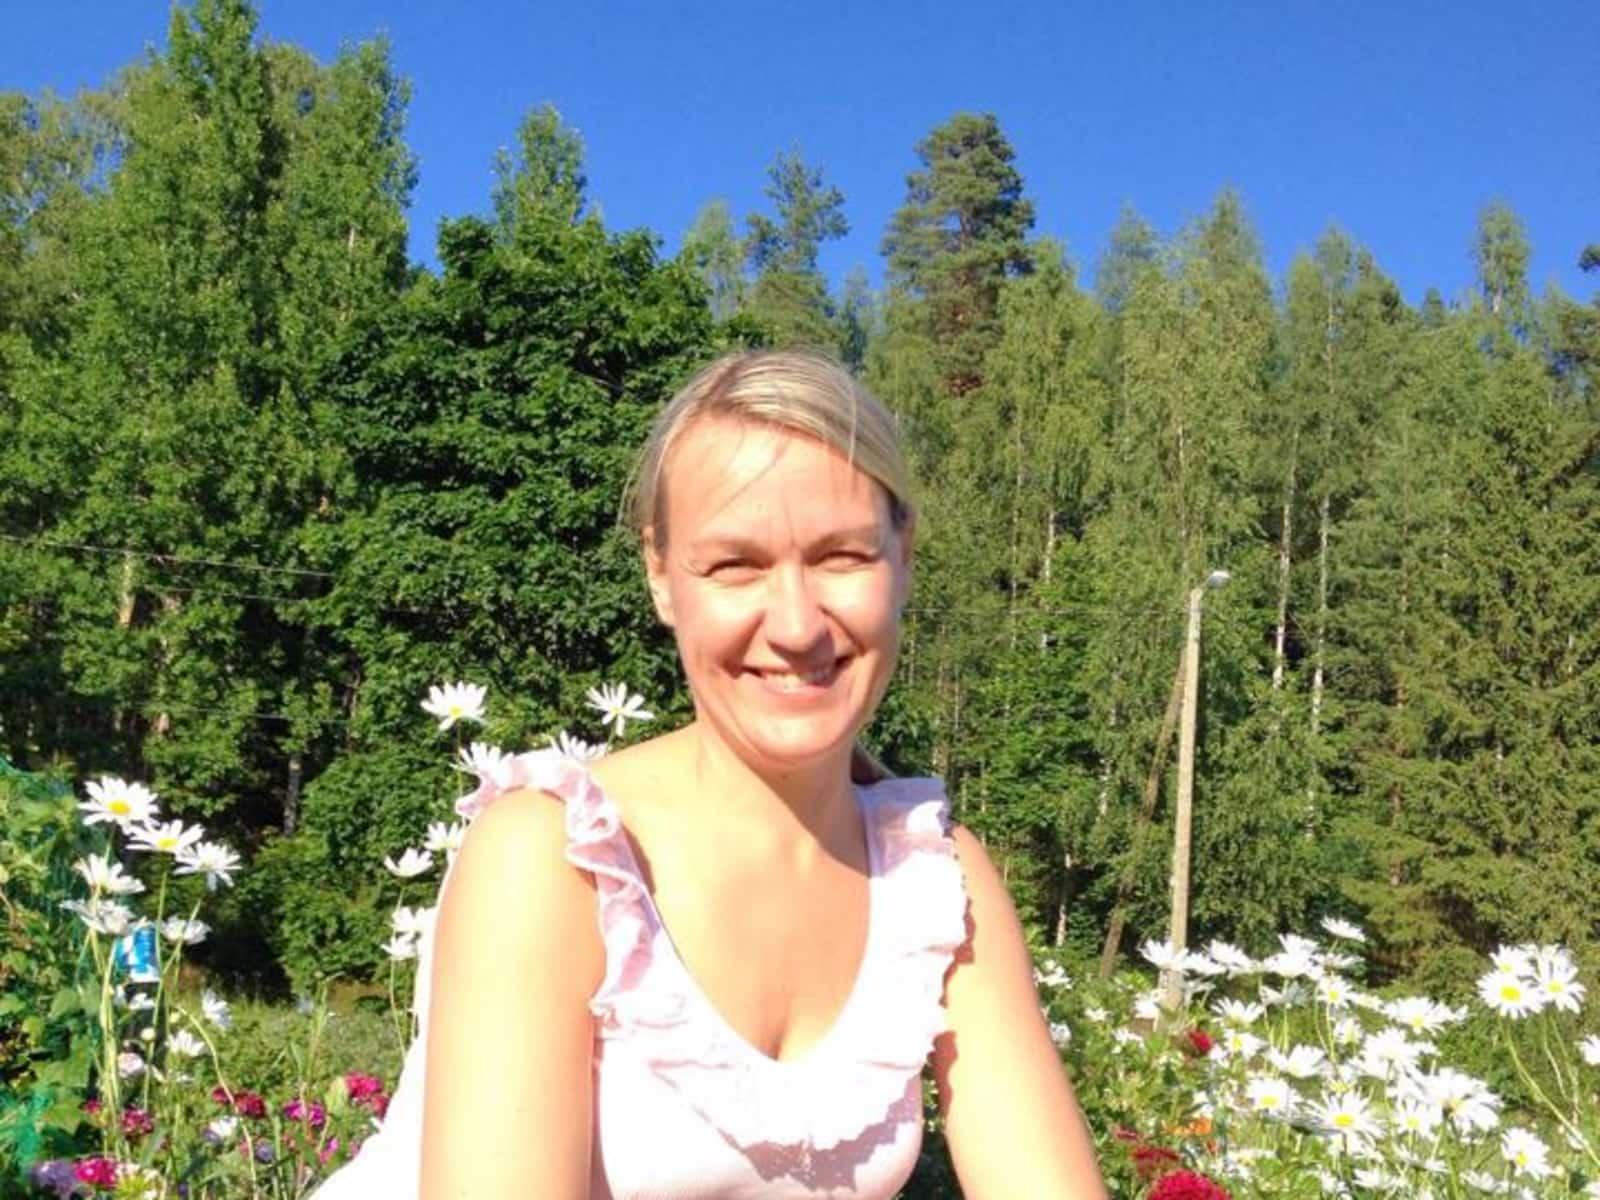 Tuula from Espoo, Finland